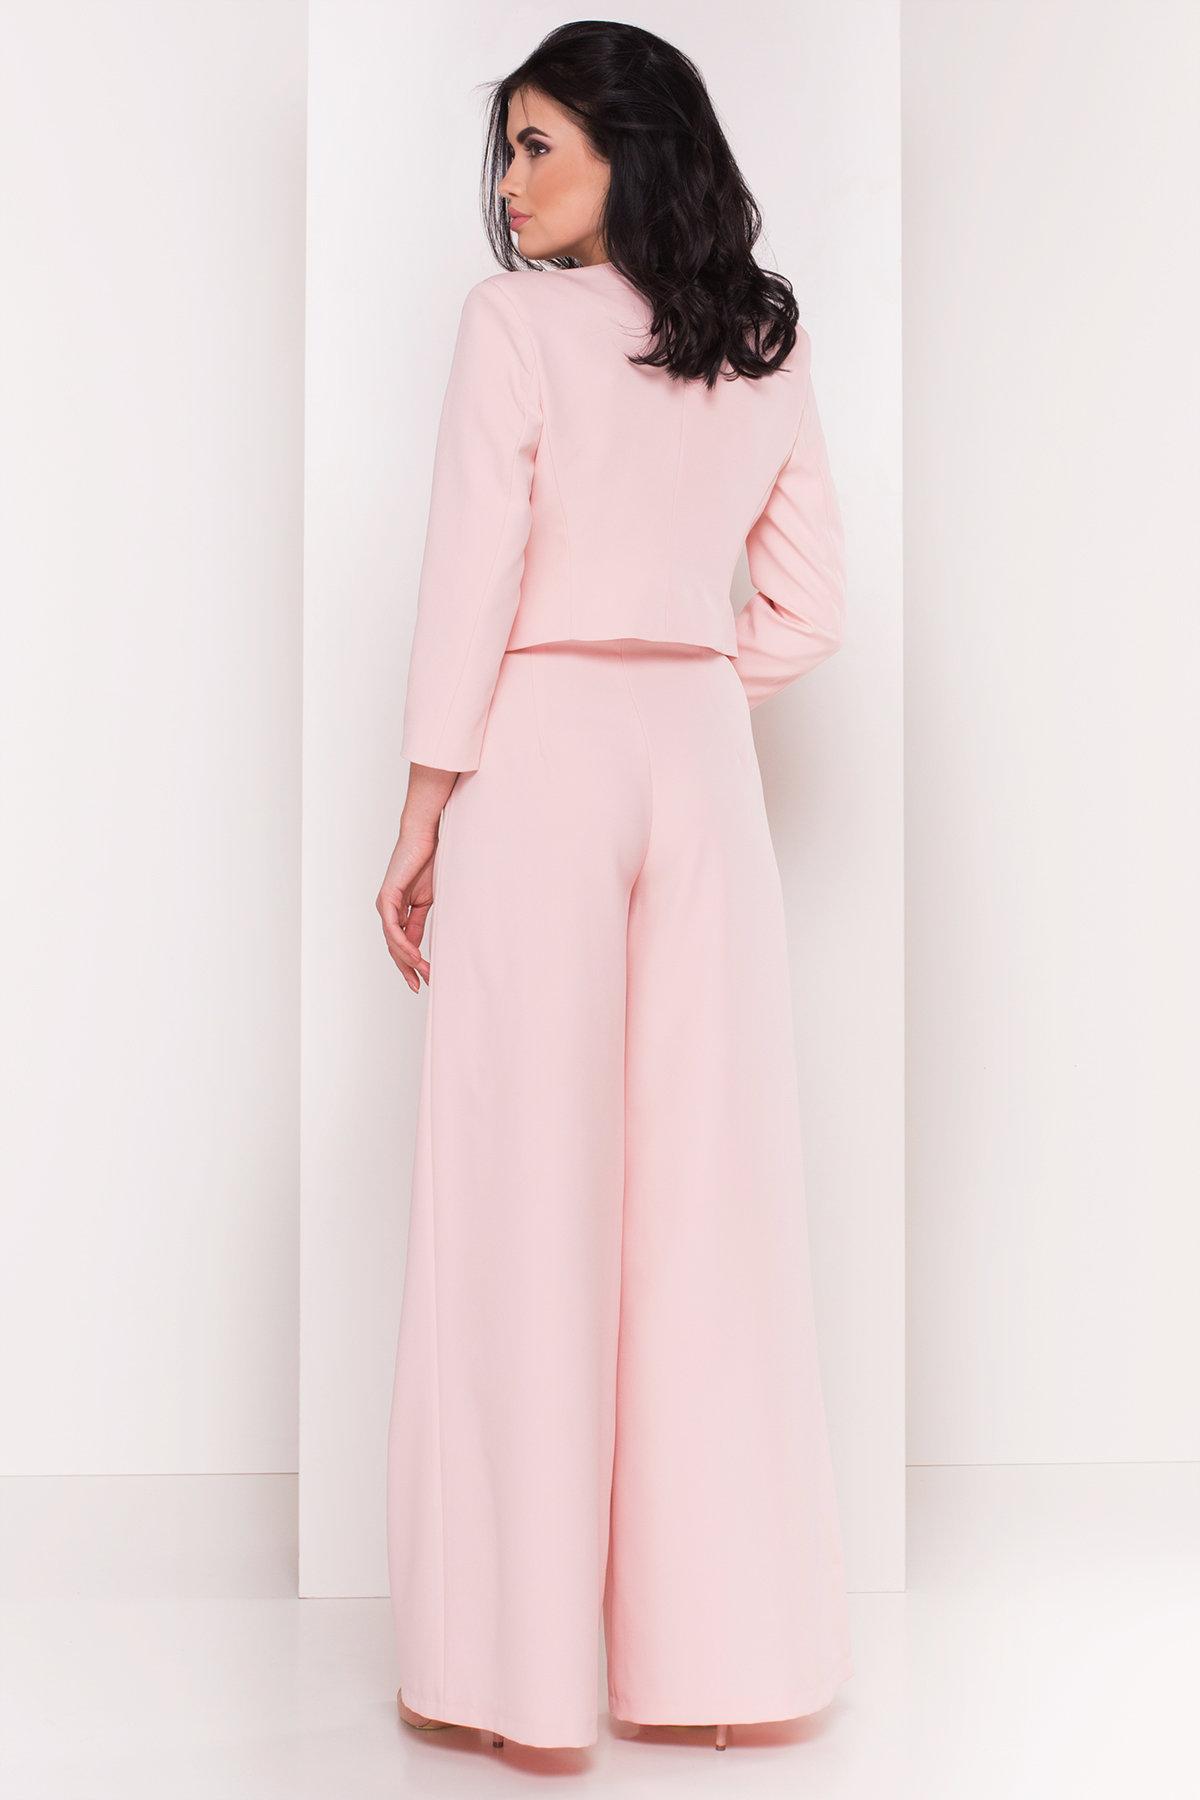 Жакет Мадлен 4896 Цвет: Розовый